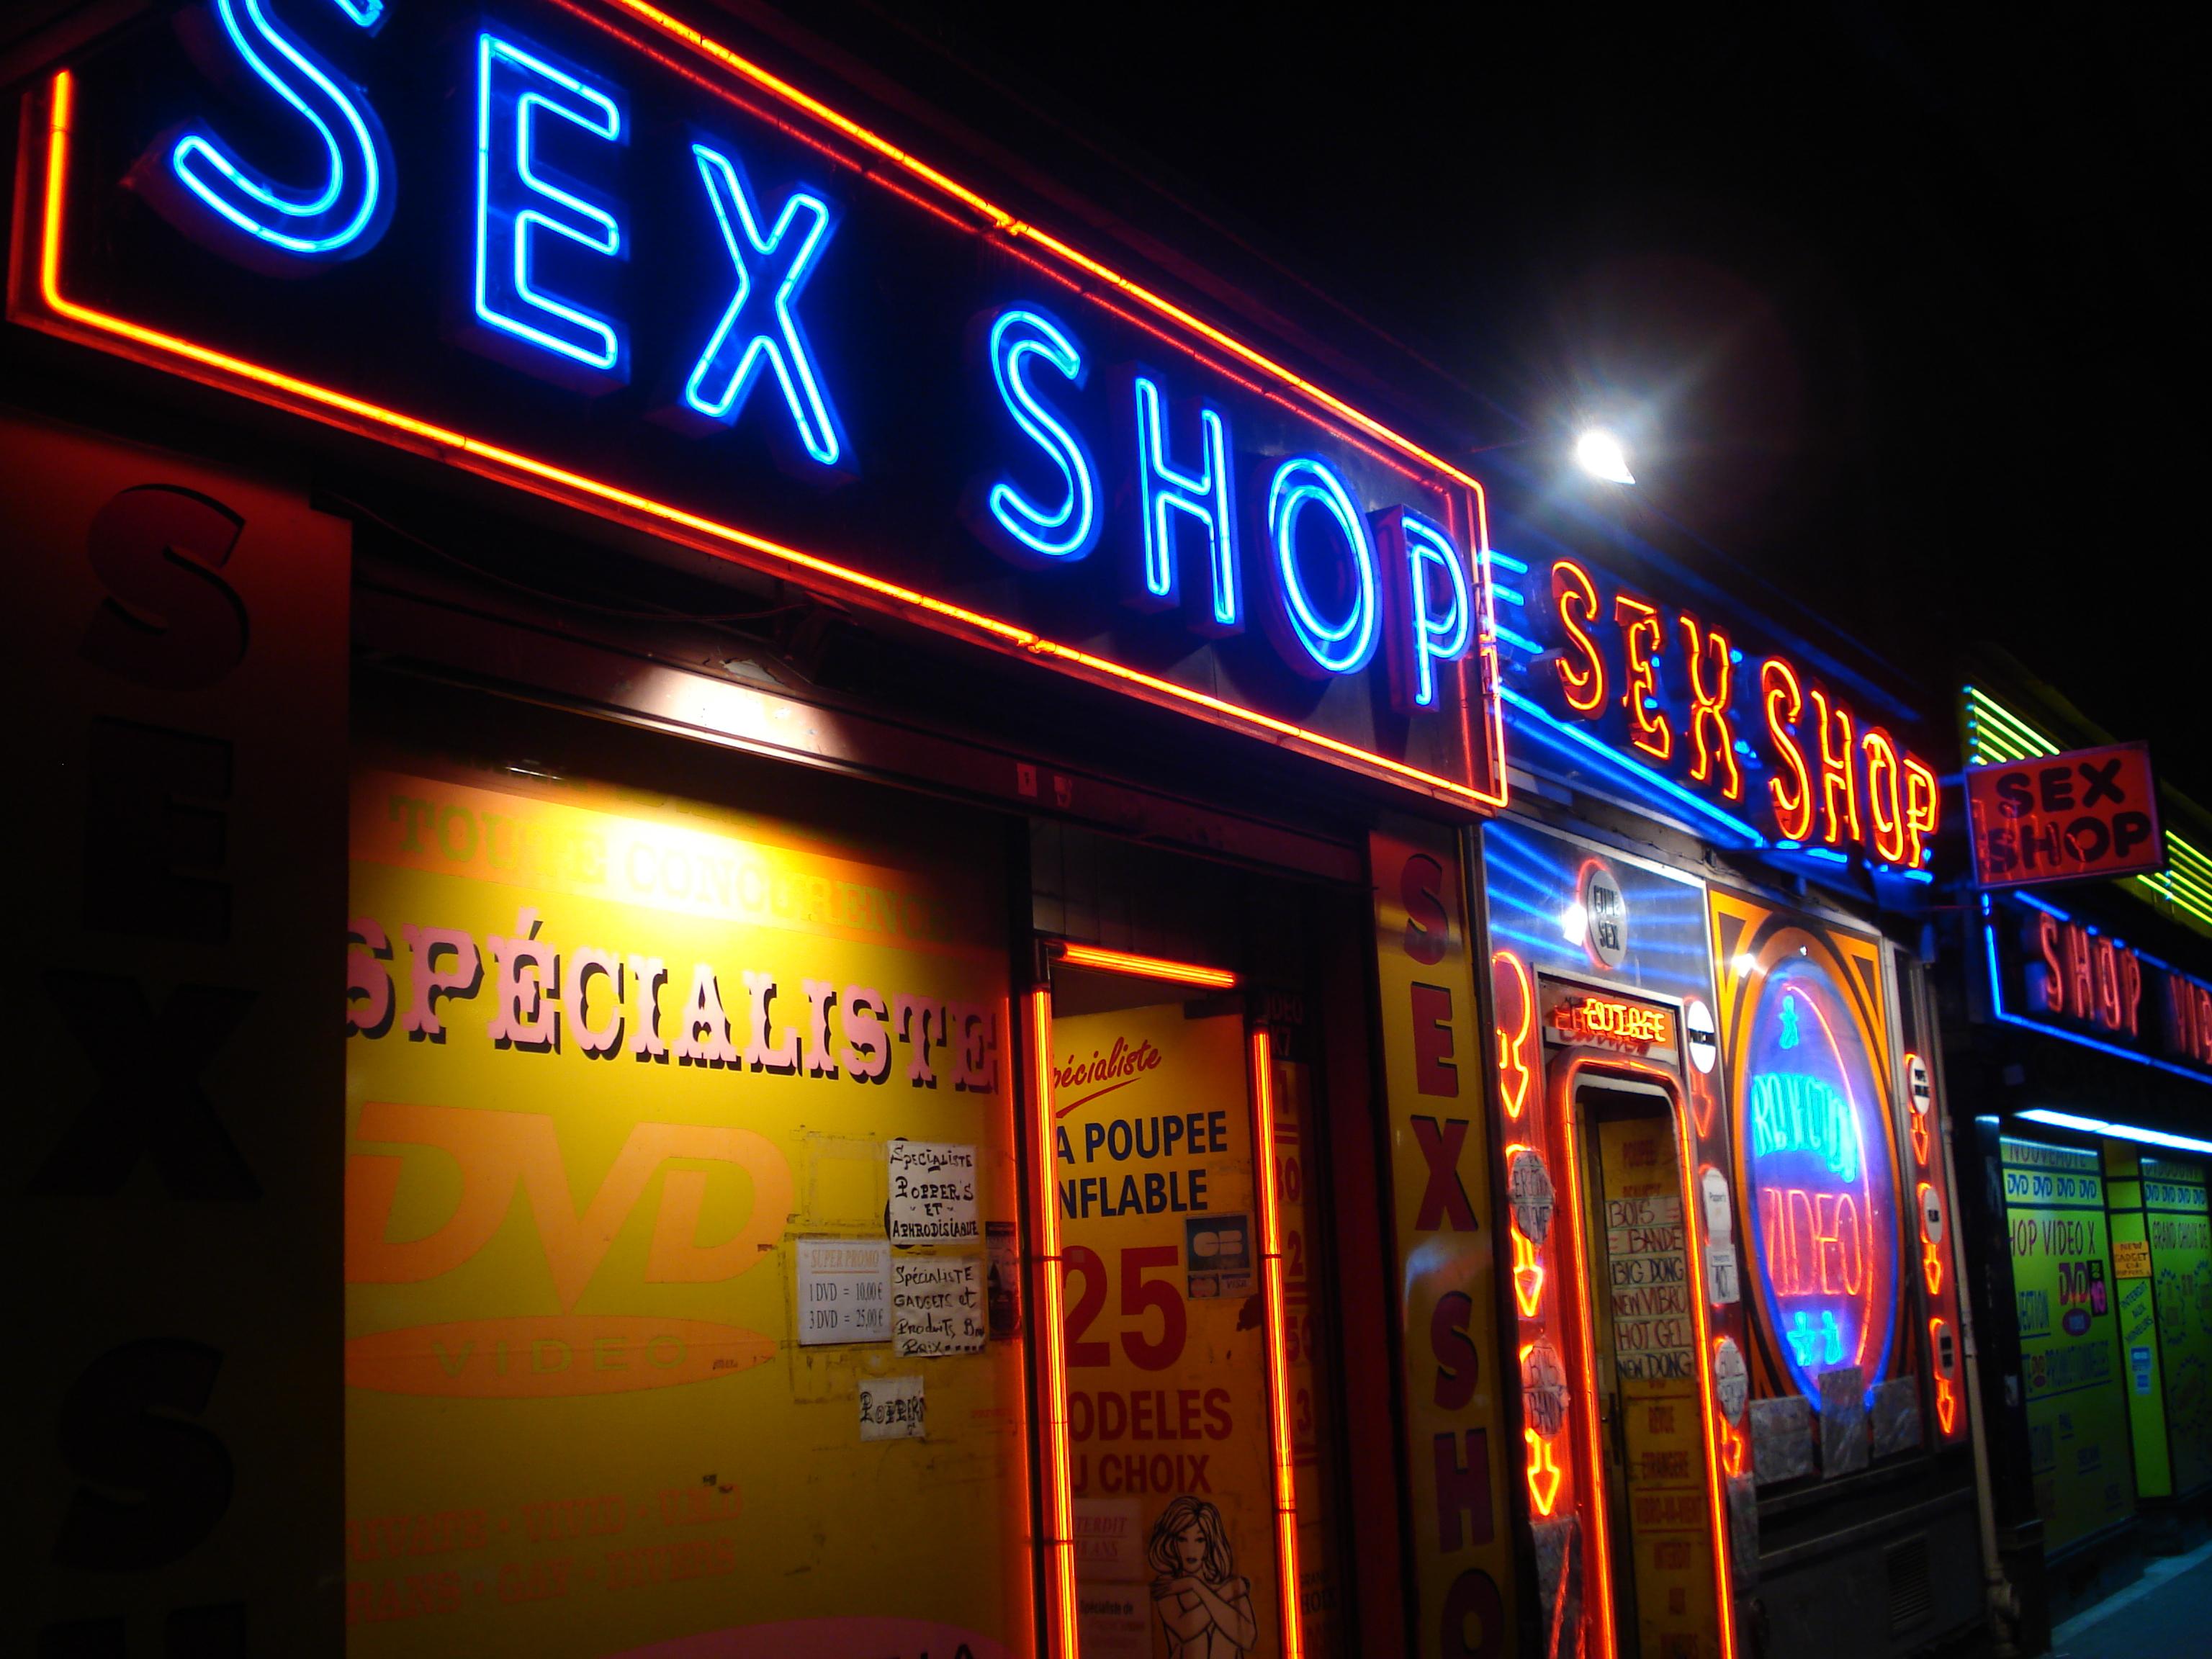 sex shop antalya